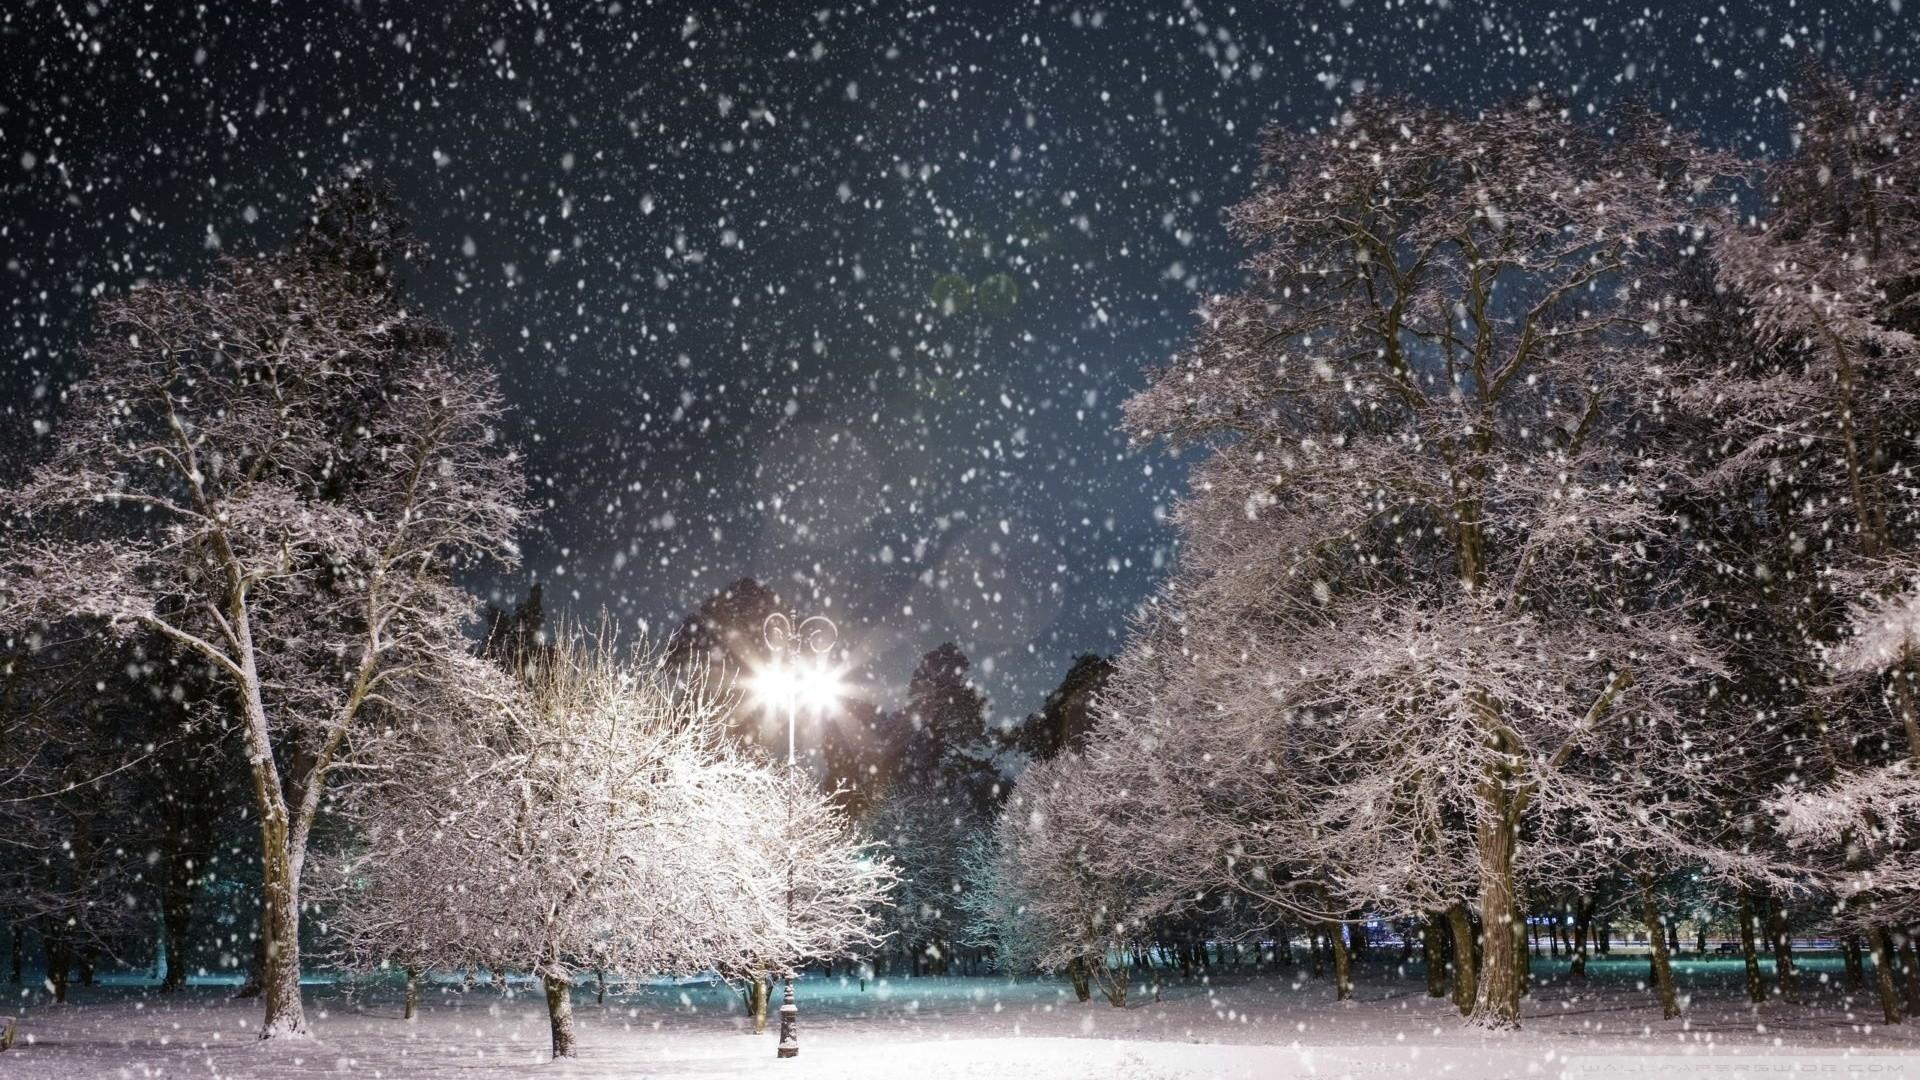 1920x1080 snow at night wallpaper 1920x1080 snow at night